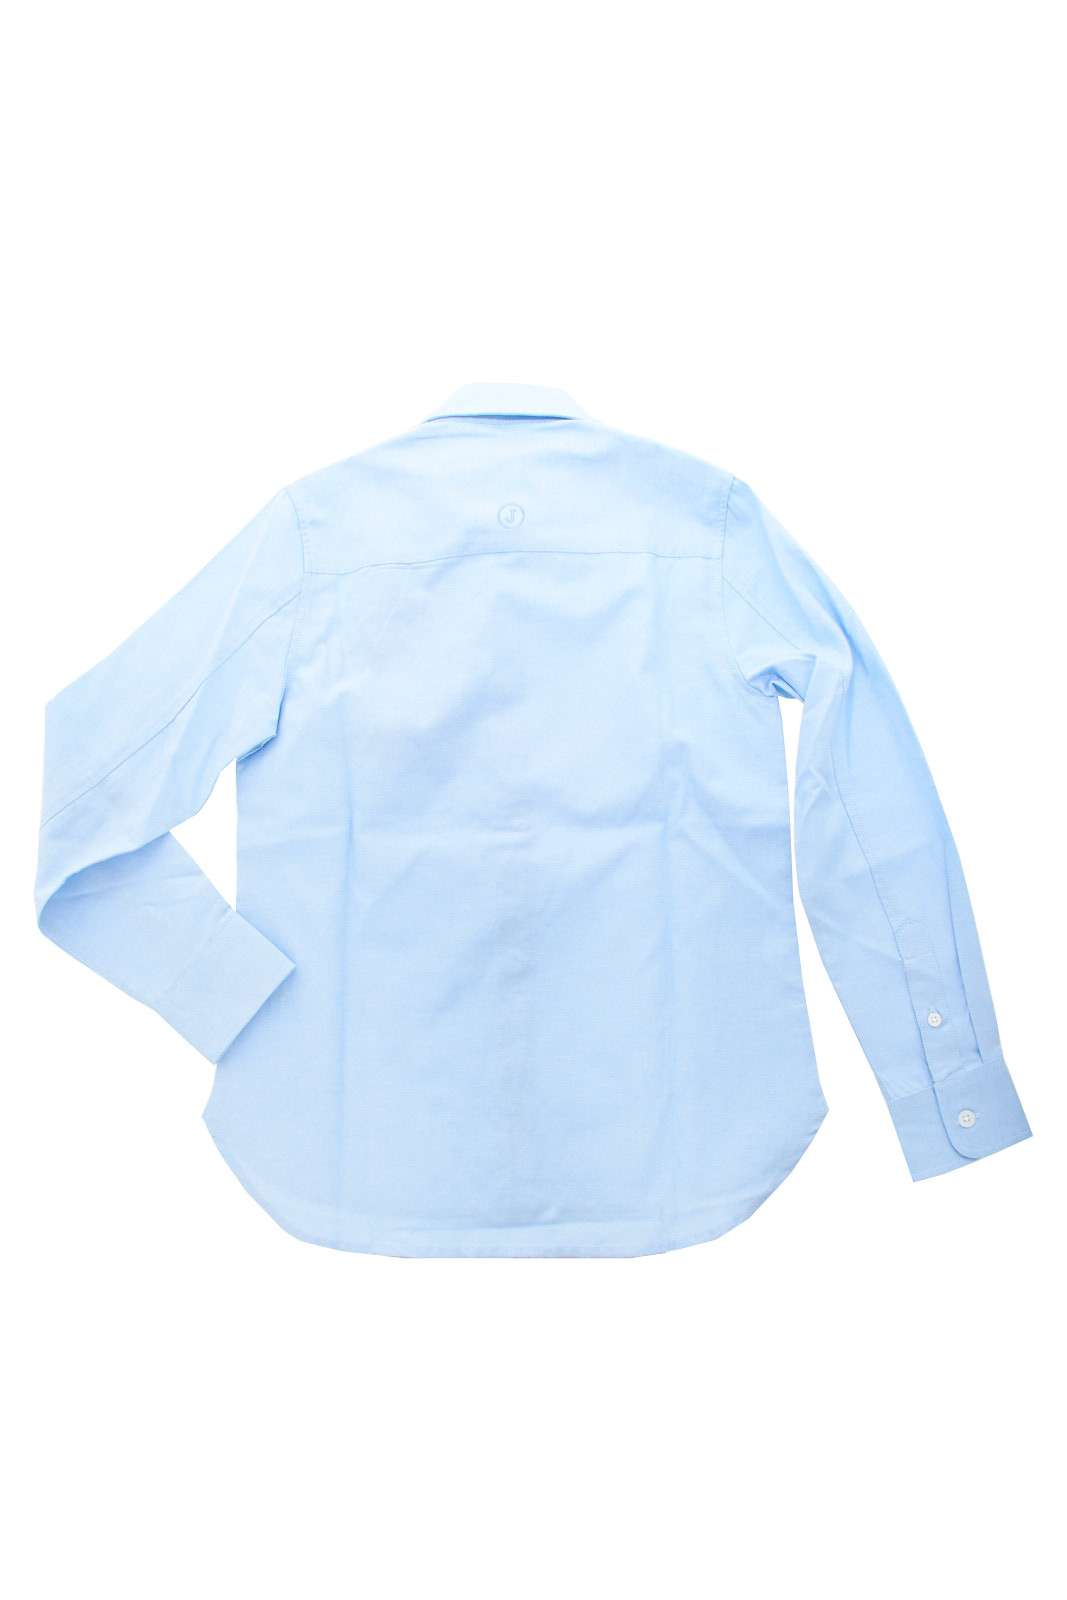 /media/catalog/product/a/i/PE-outlet_parmax-camicia-bambino-Jeckerson-J1332-B.jpg